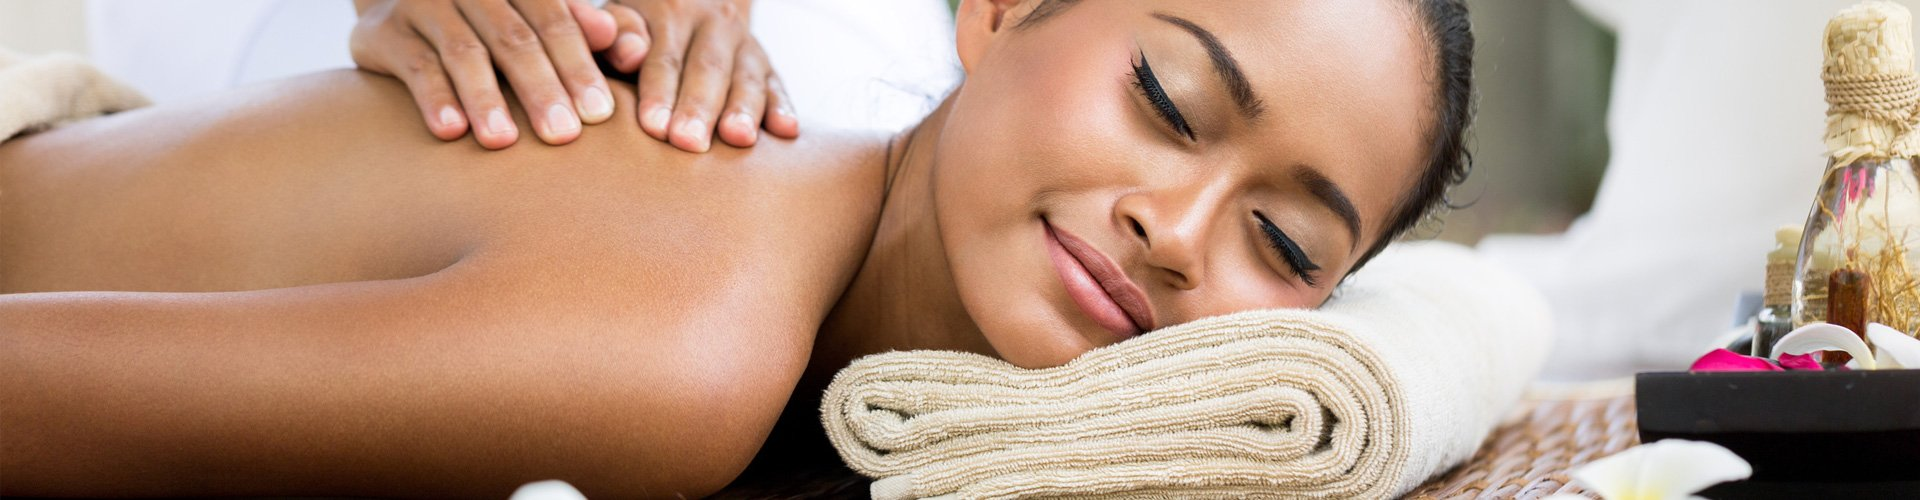 ThaiThip Massage